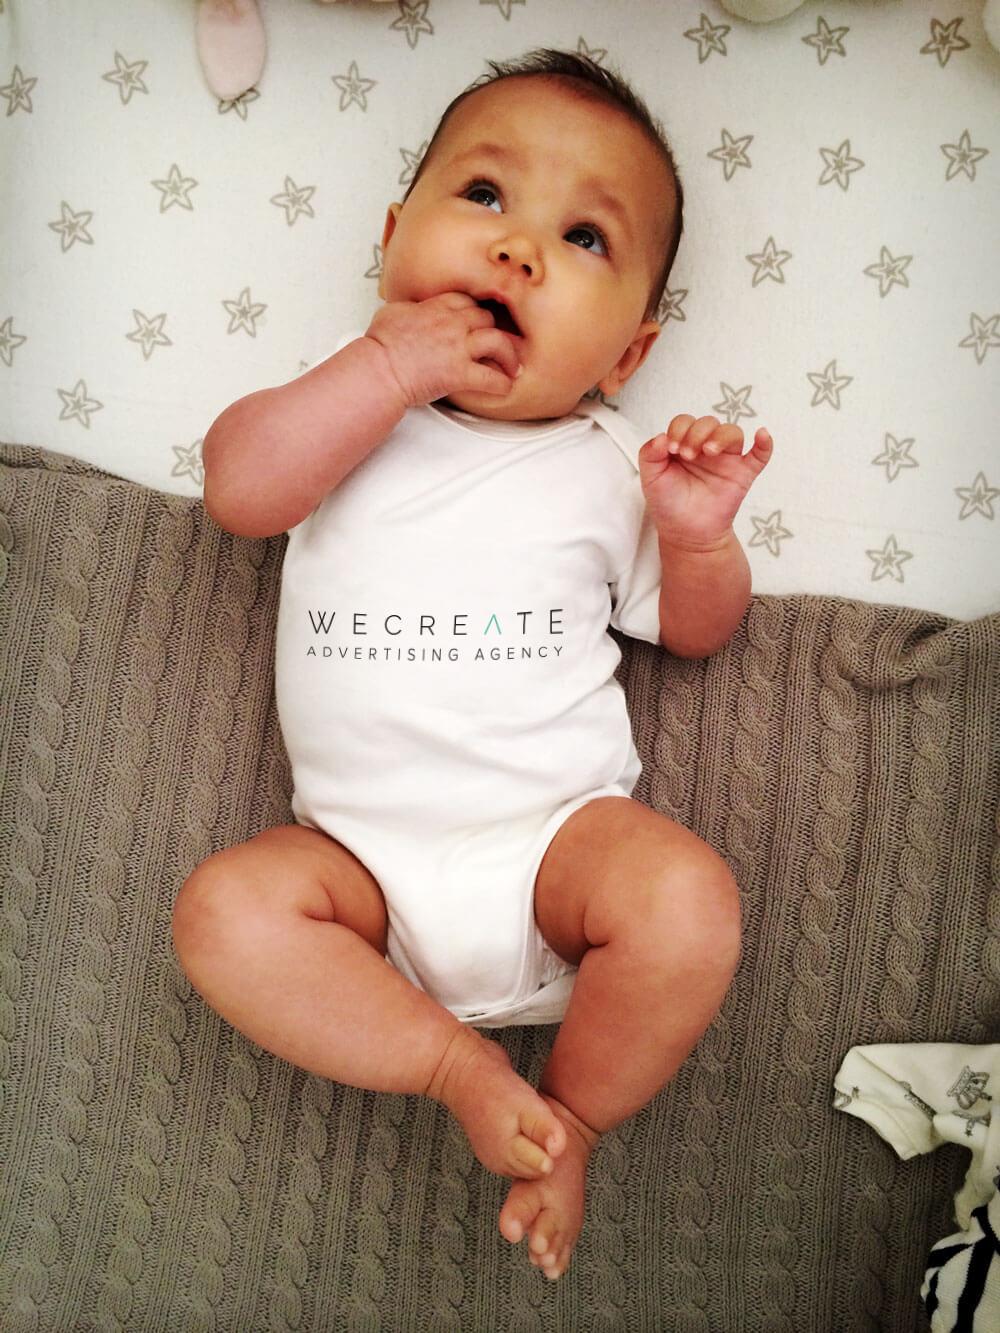 advertising agency hk WECREATE baby branding - Expansion of the team :)